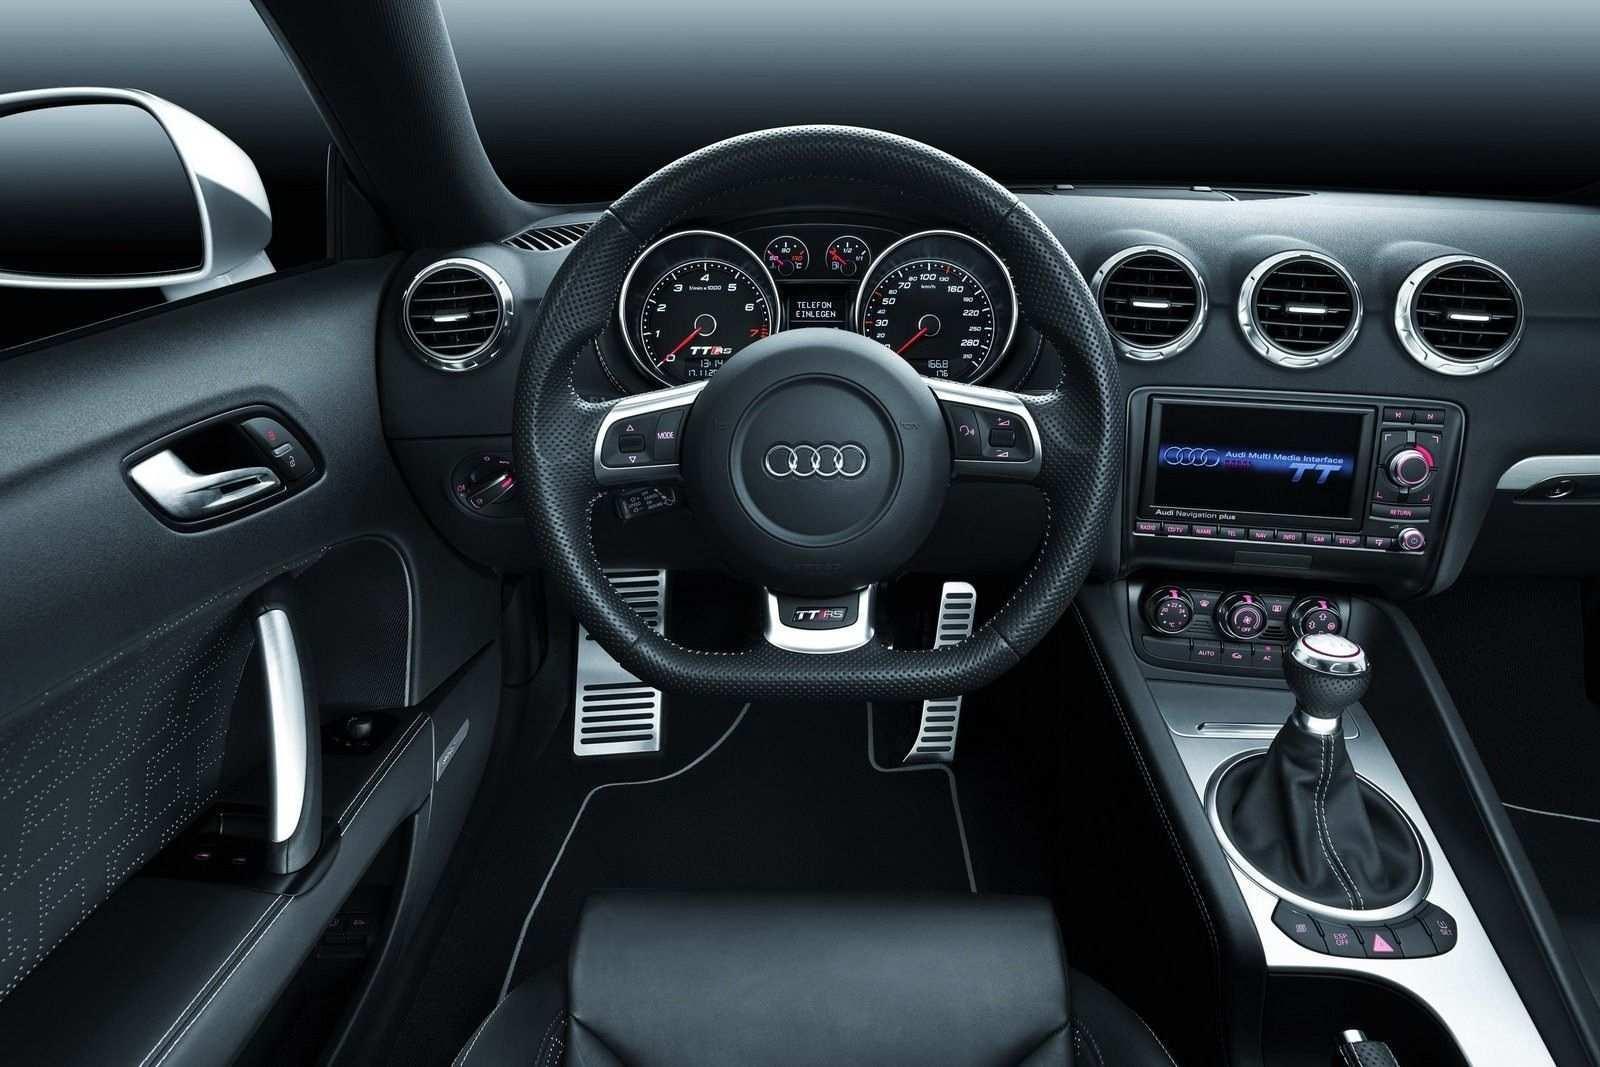 84 New Audi Tt Roadster 2020 Research New with Audi Tt Roadster 2020